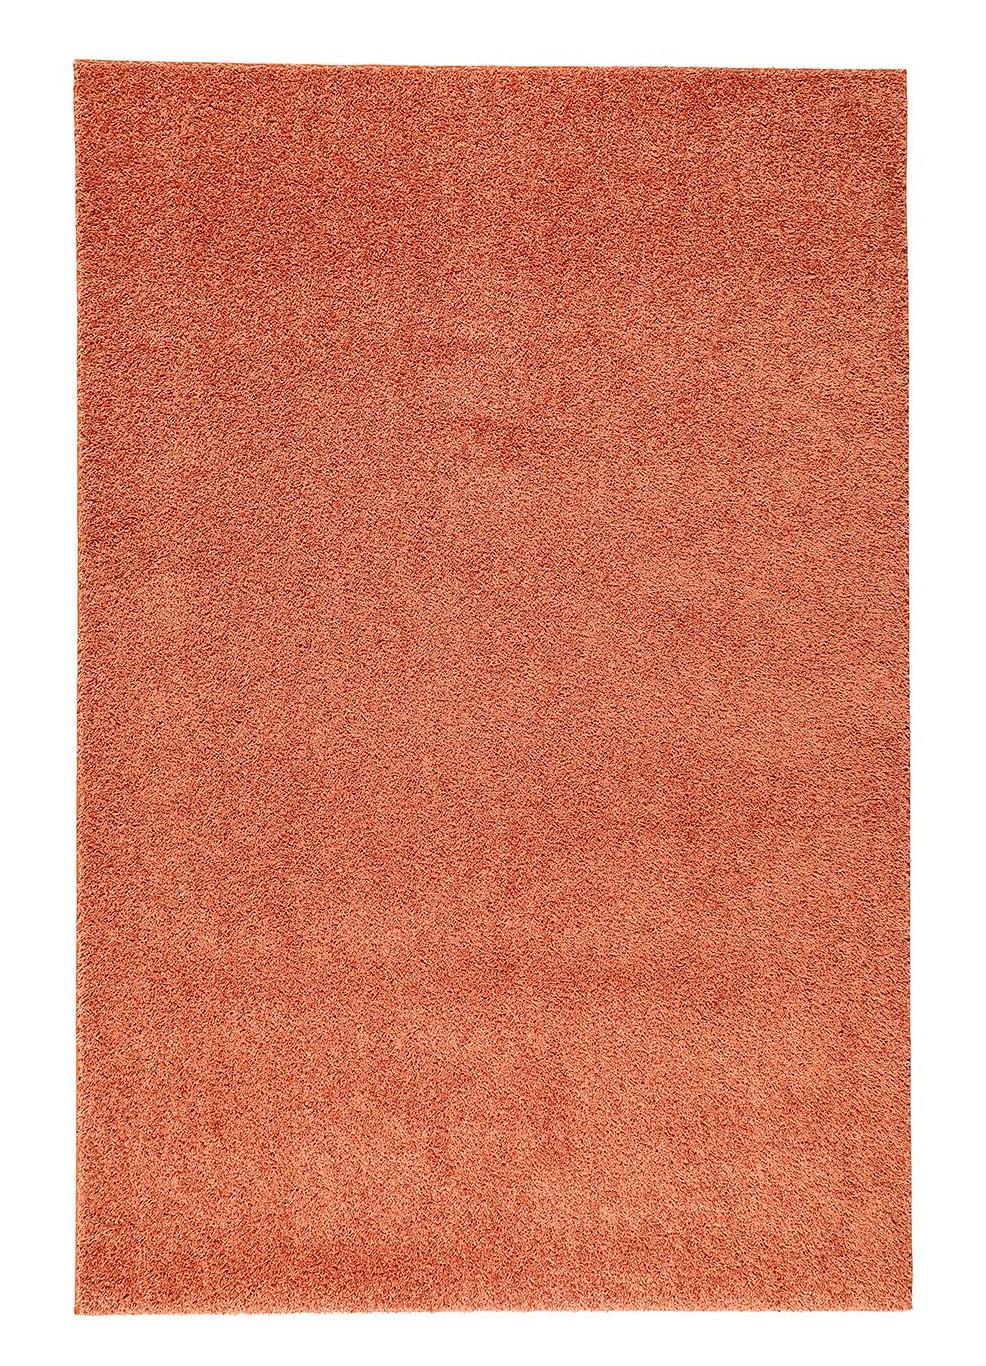 VM Carpet Tessa matto 2167 oranssi